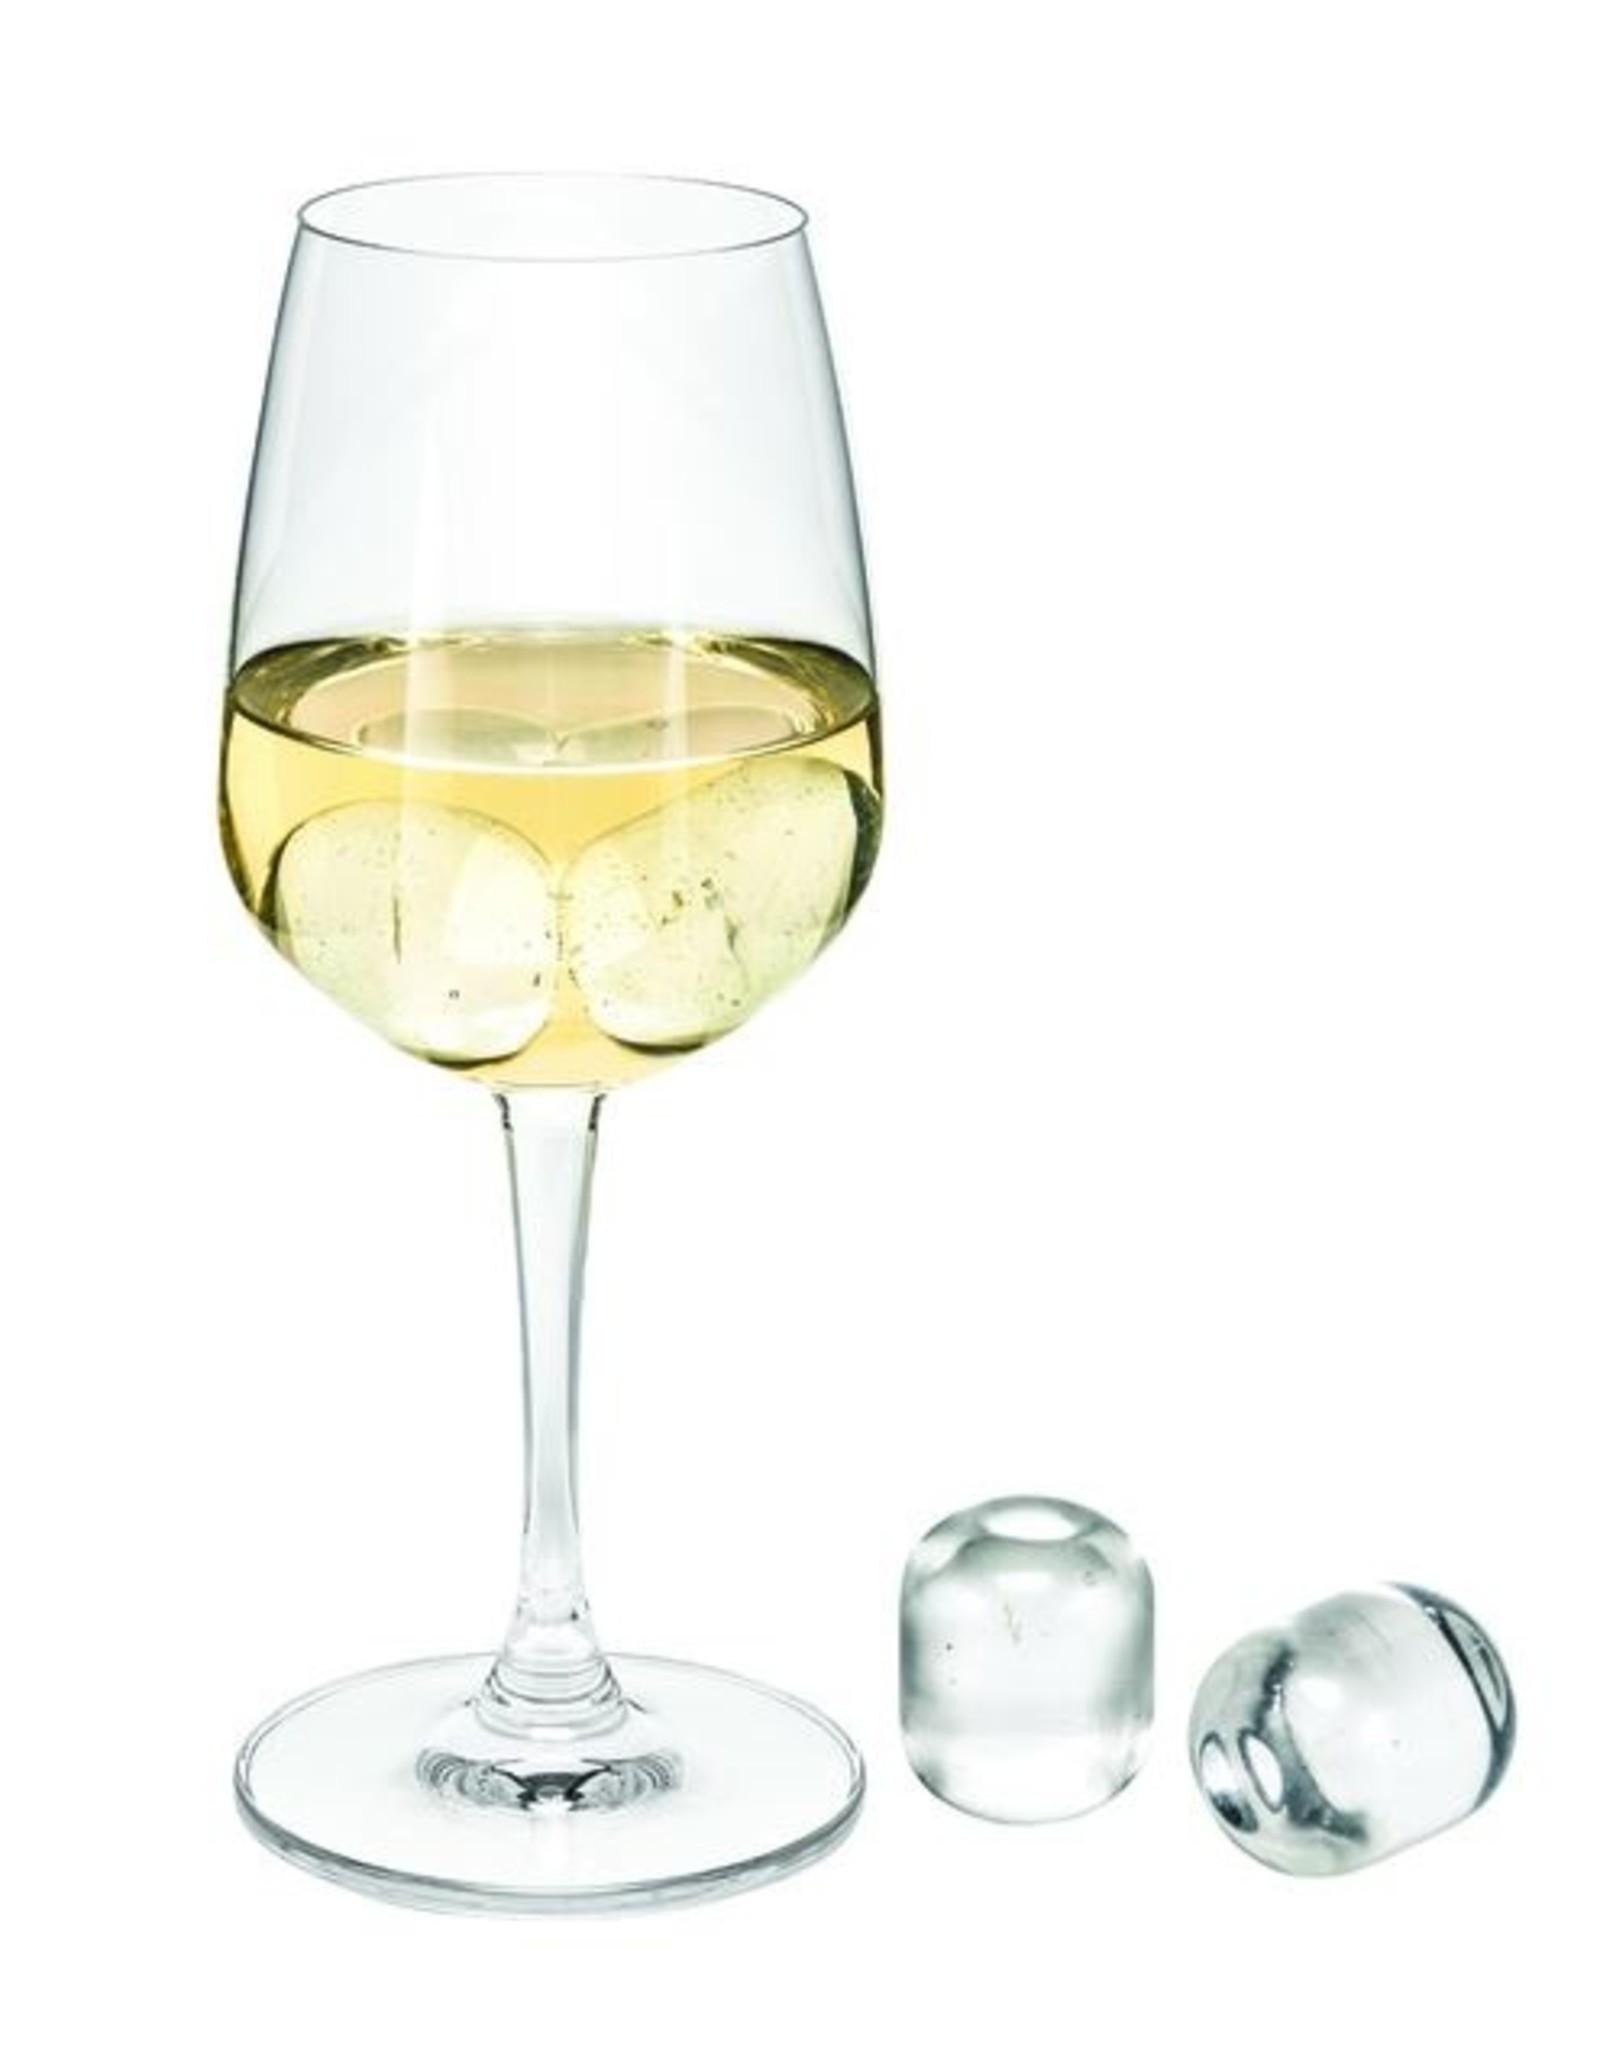 Avanti AVANTI CRYSTAL WINE/GIN PEARLS-SET OF 4